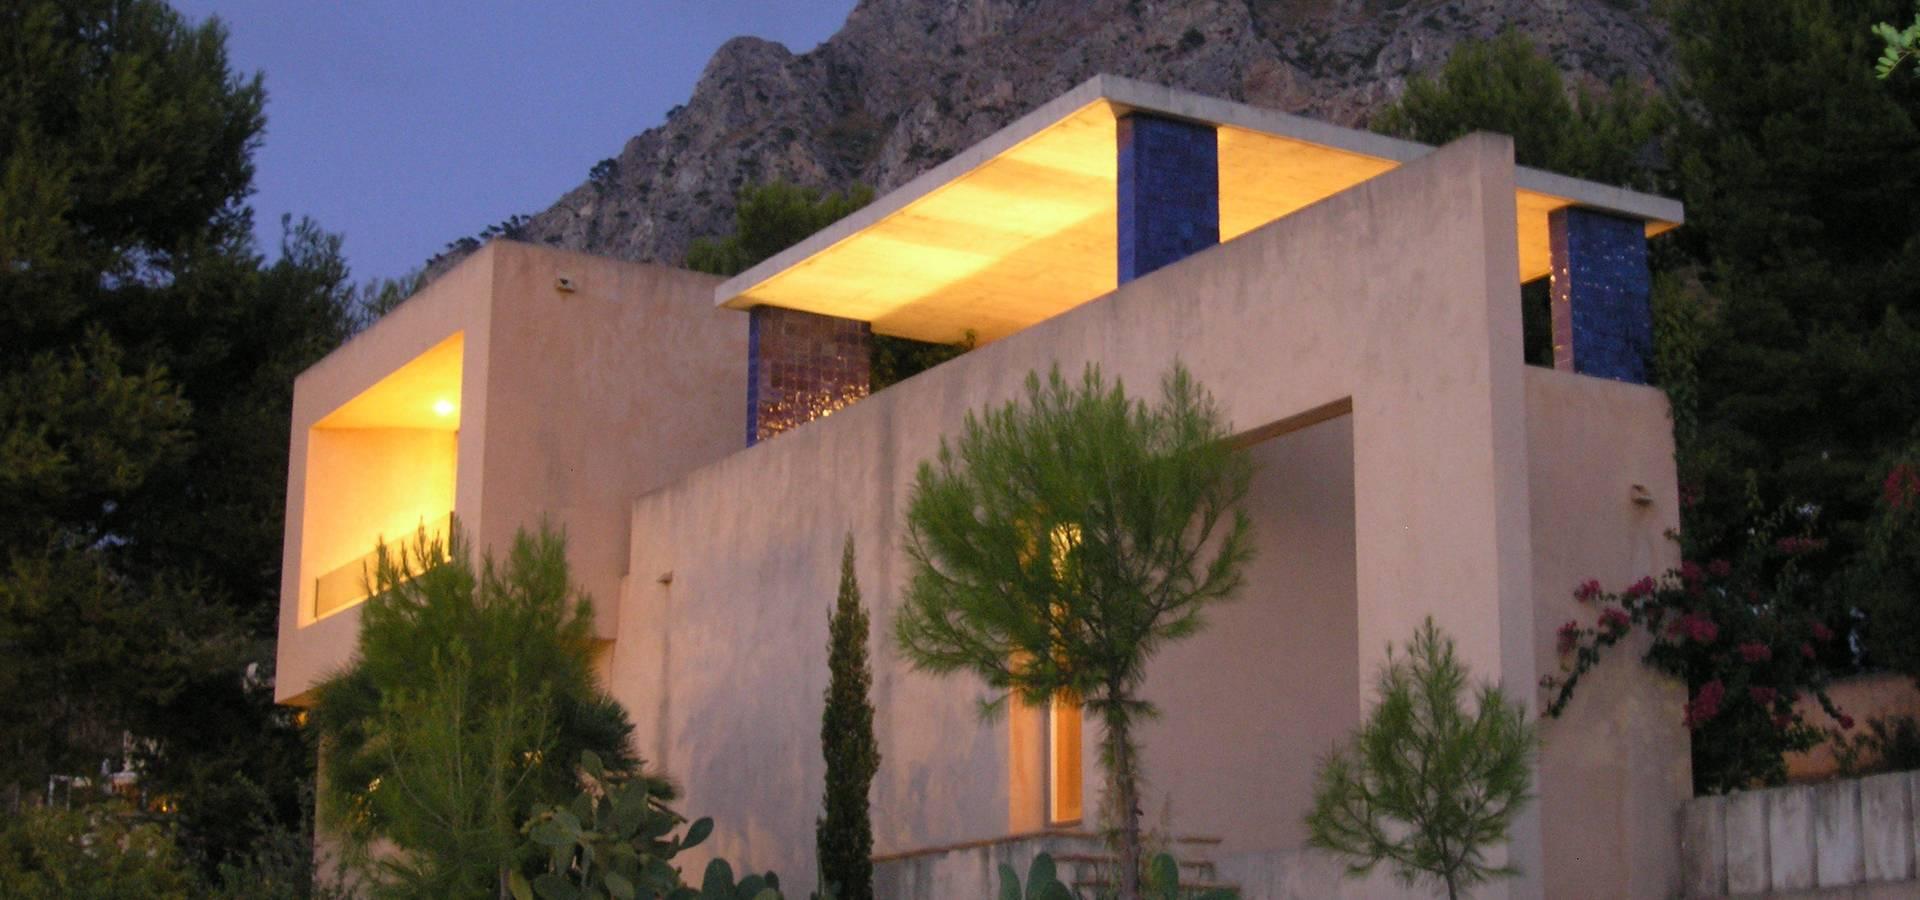 Carlos serra arquitecto architects in art homify - Carlos serra ...